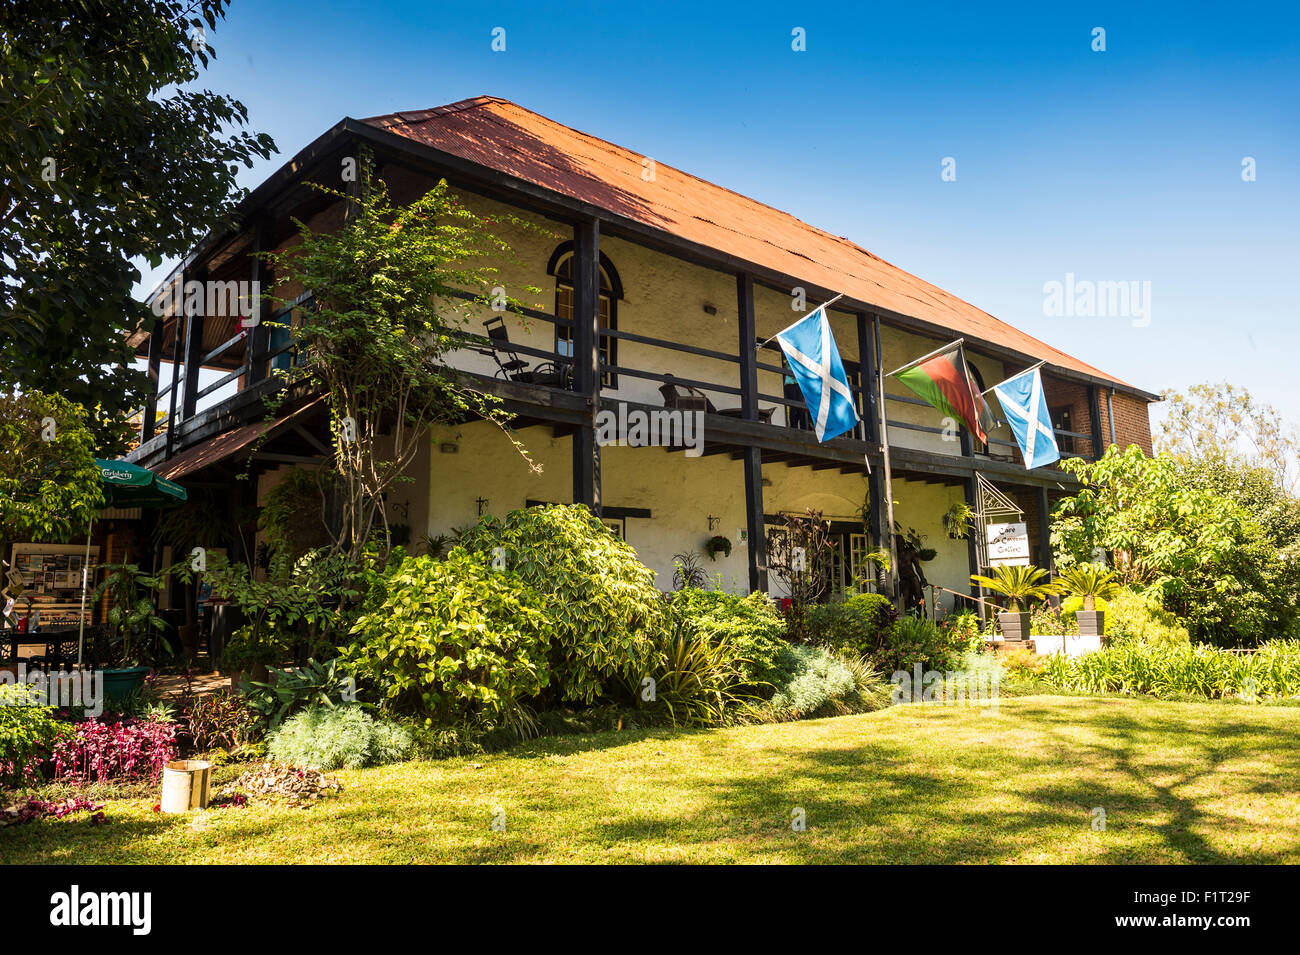 La storica casa del mandala, Blantyre, Malawi, Africa Foto Stock